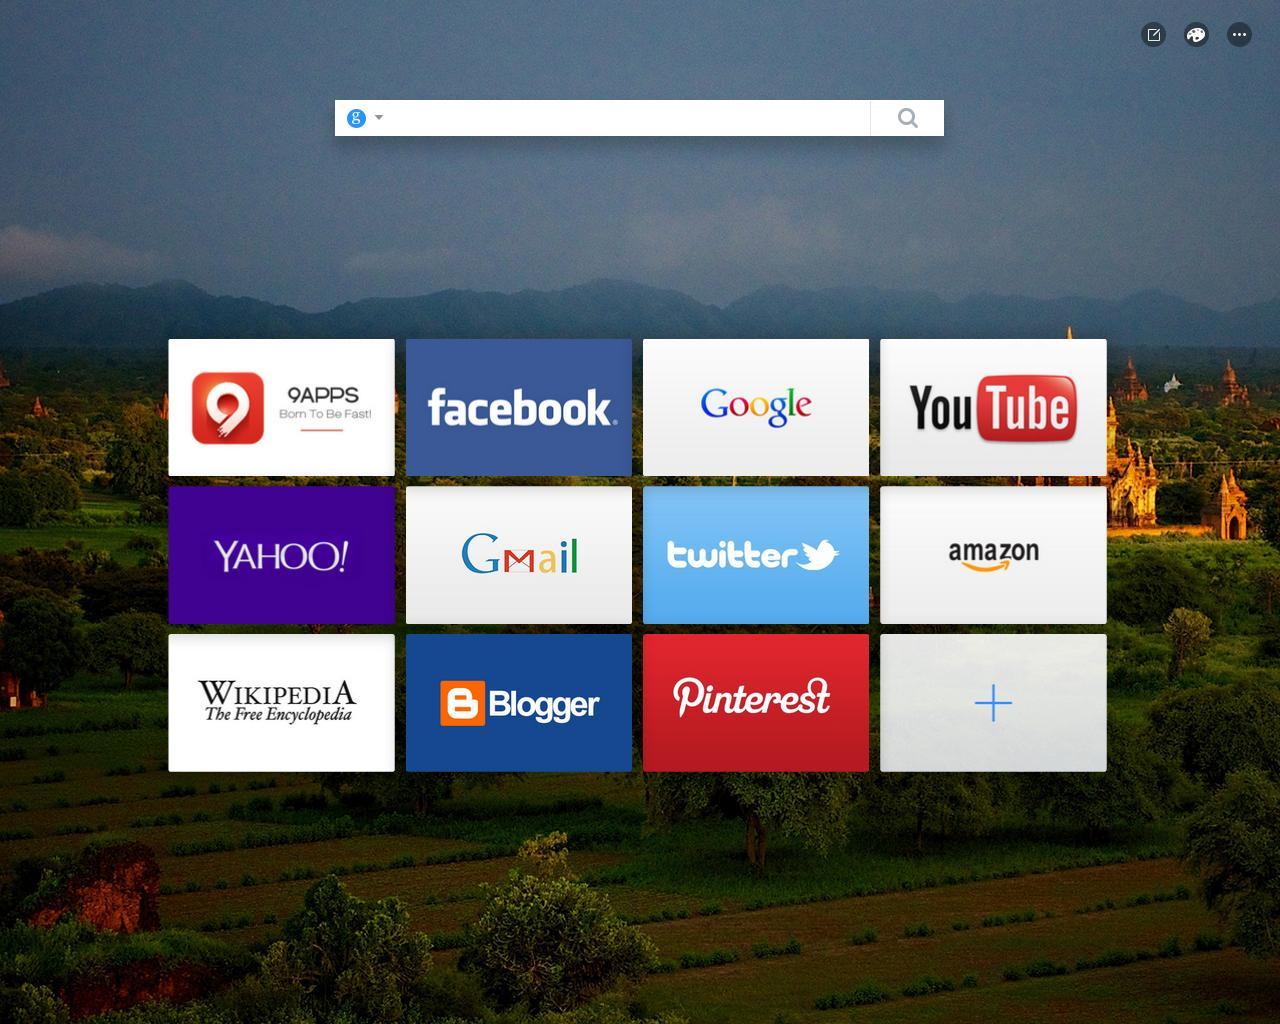 UC Browser For PC (Windows - Laptop, Desktop) | Nepali Internet Tricks